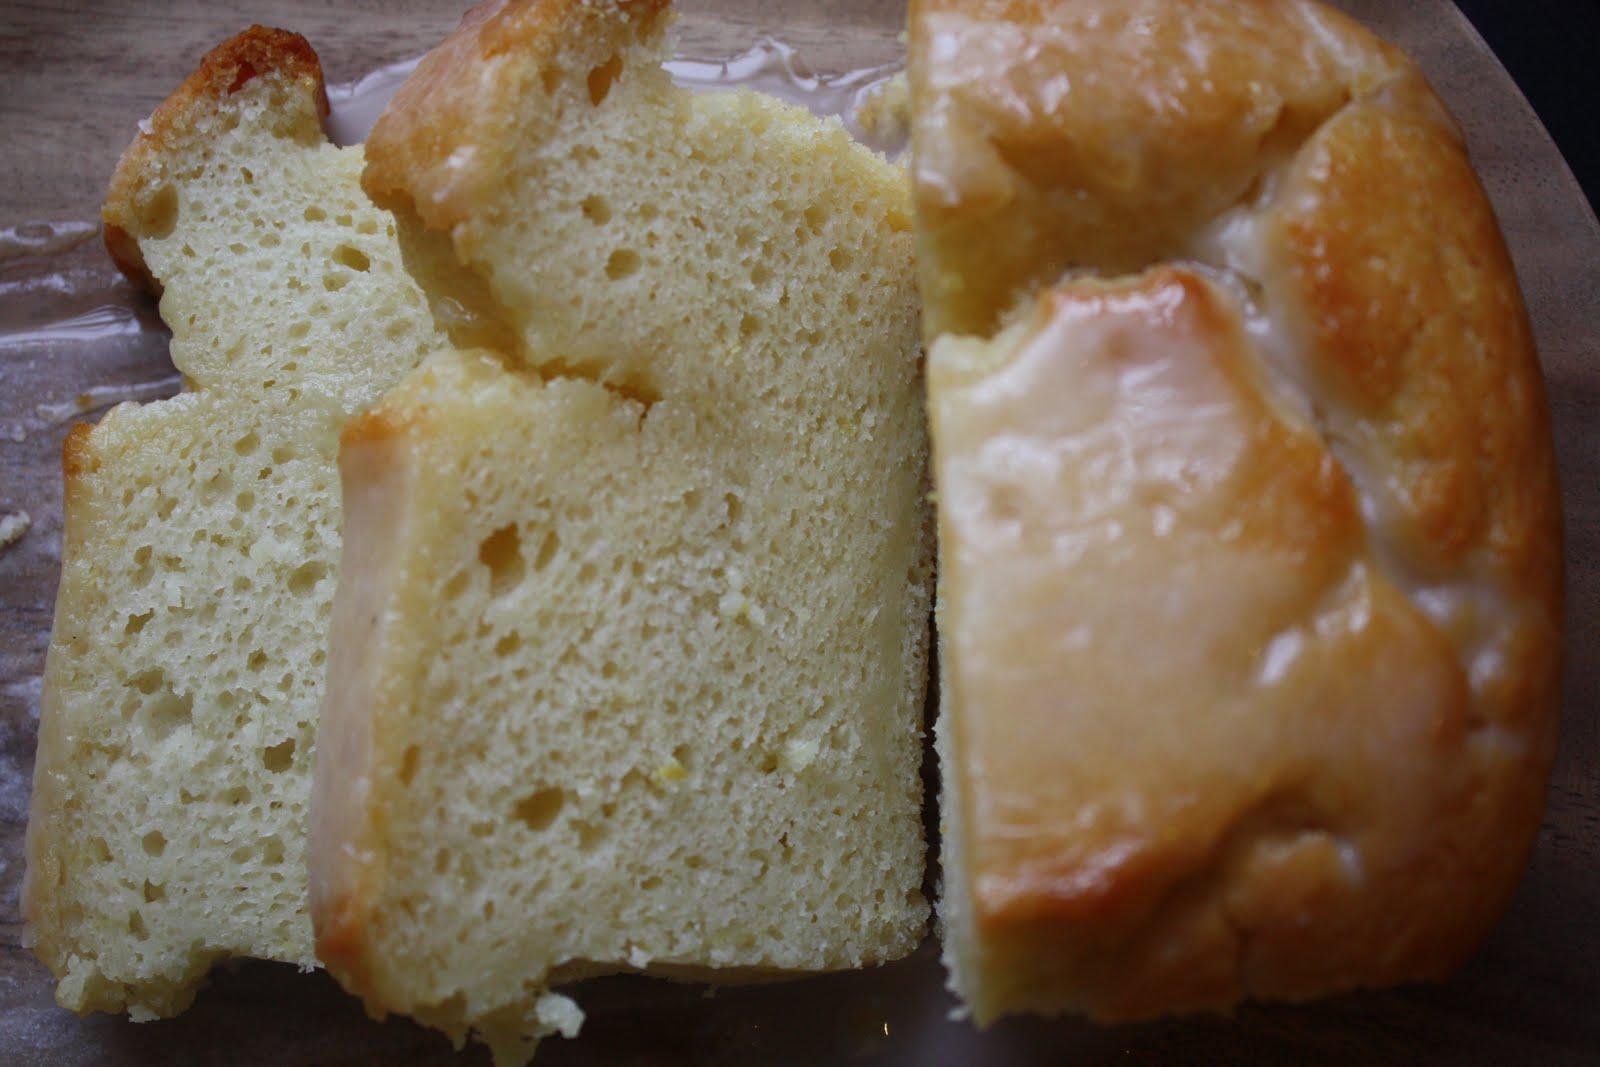 Sparrows & Spatulas: Ina's Lemon Yogurt Cake with Lemon Glaze